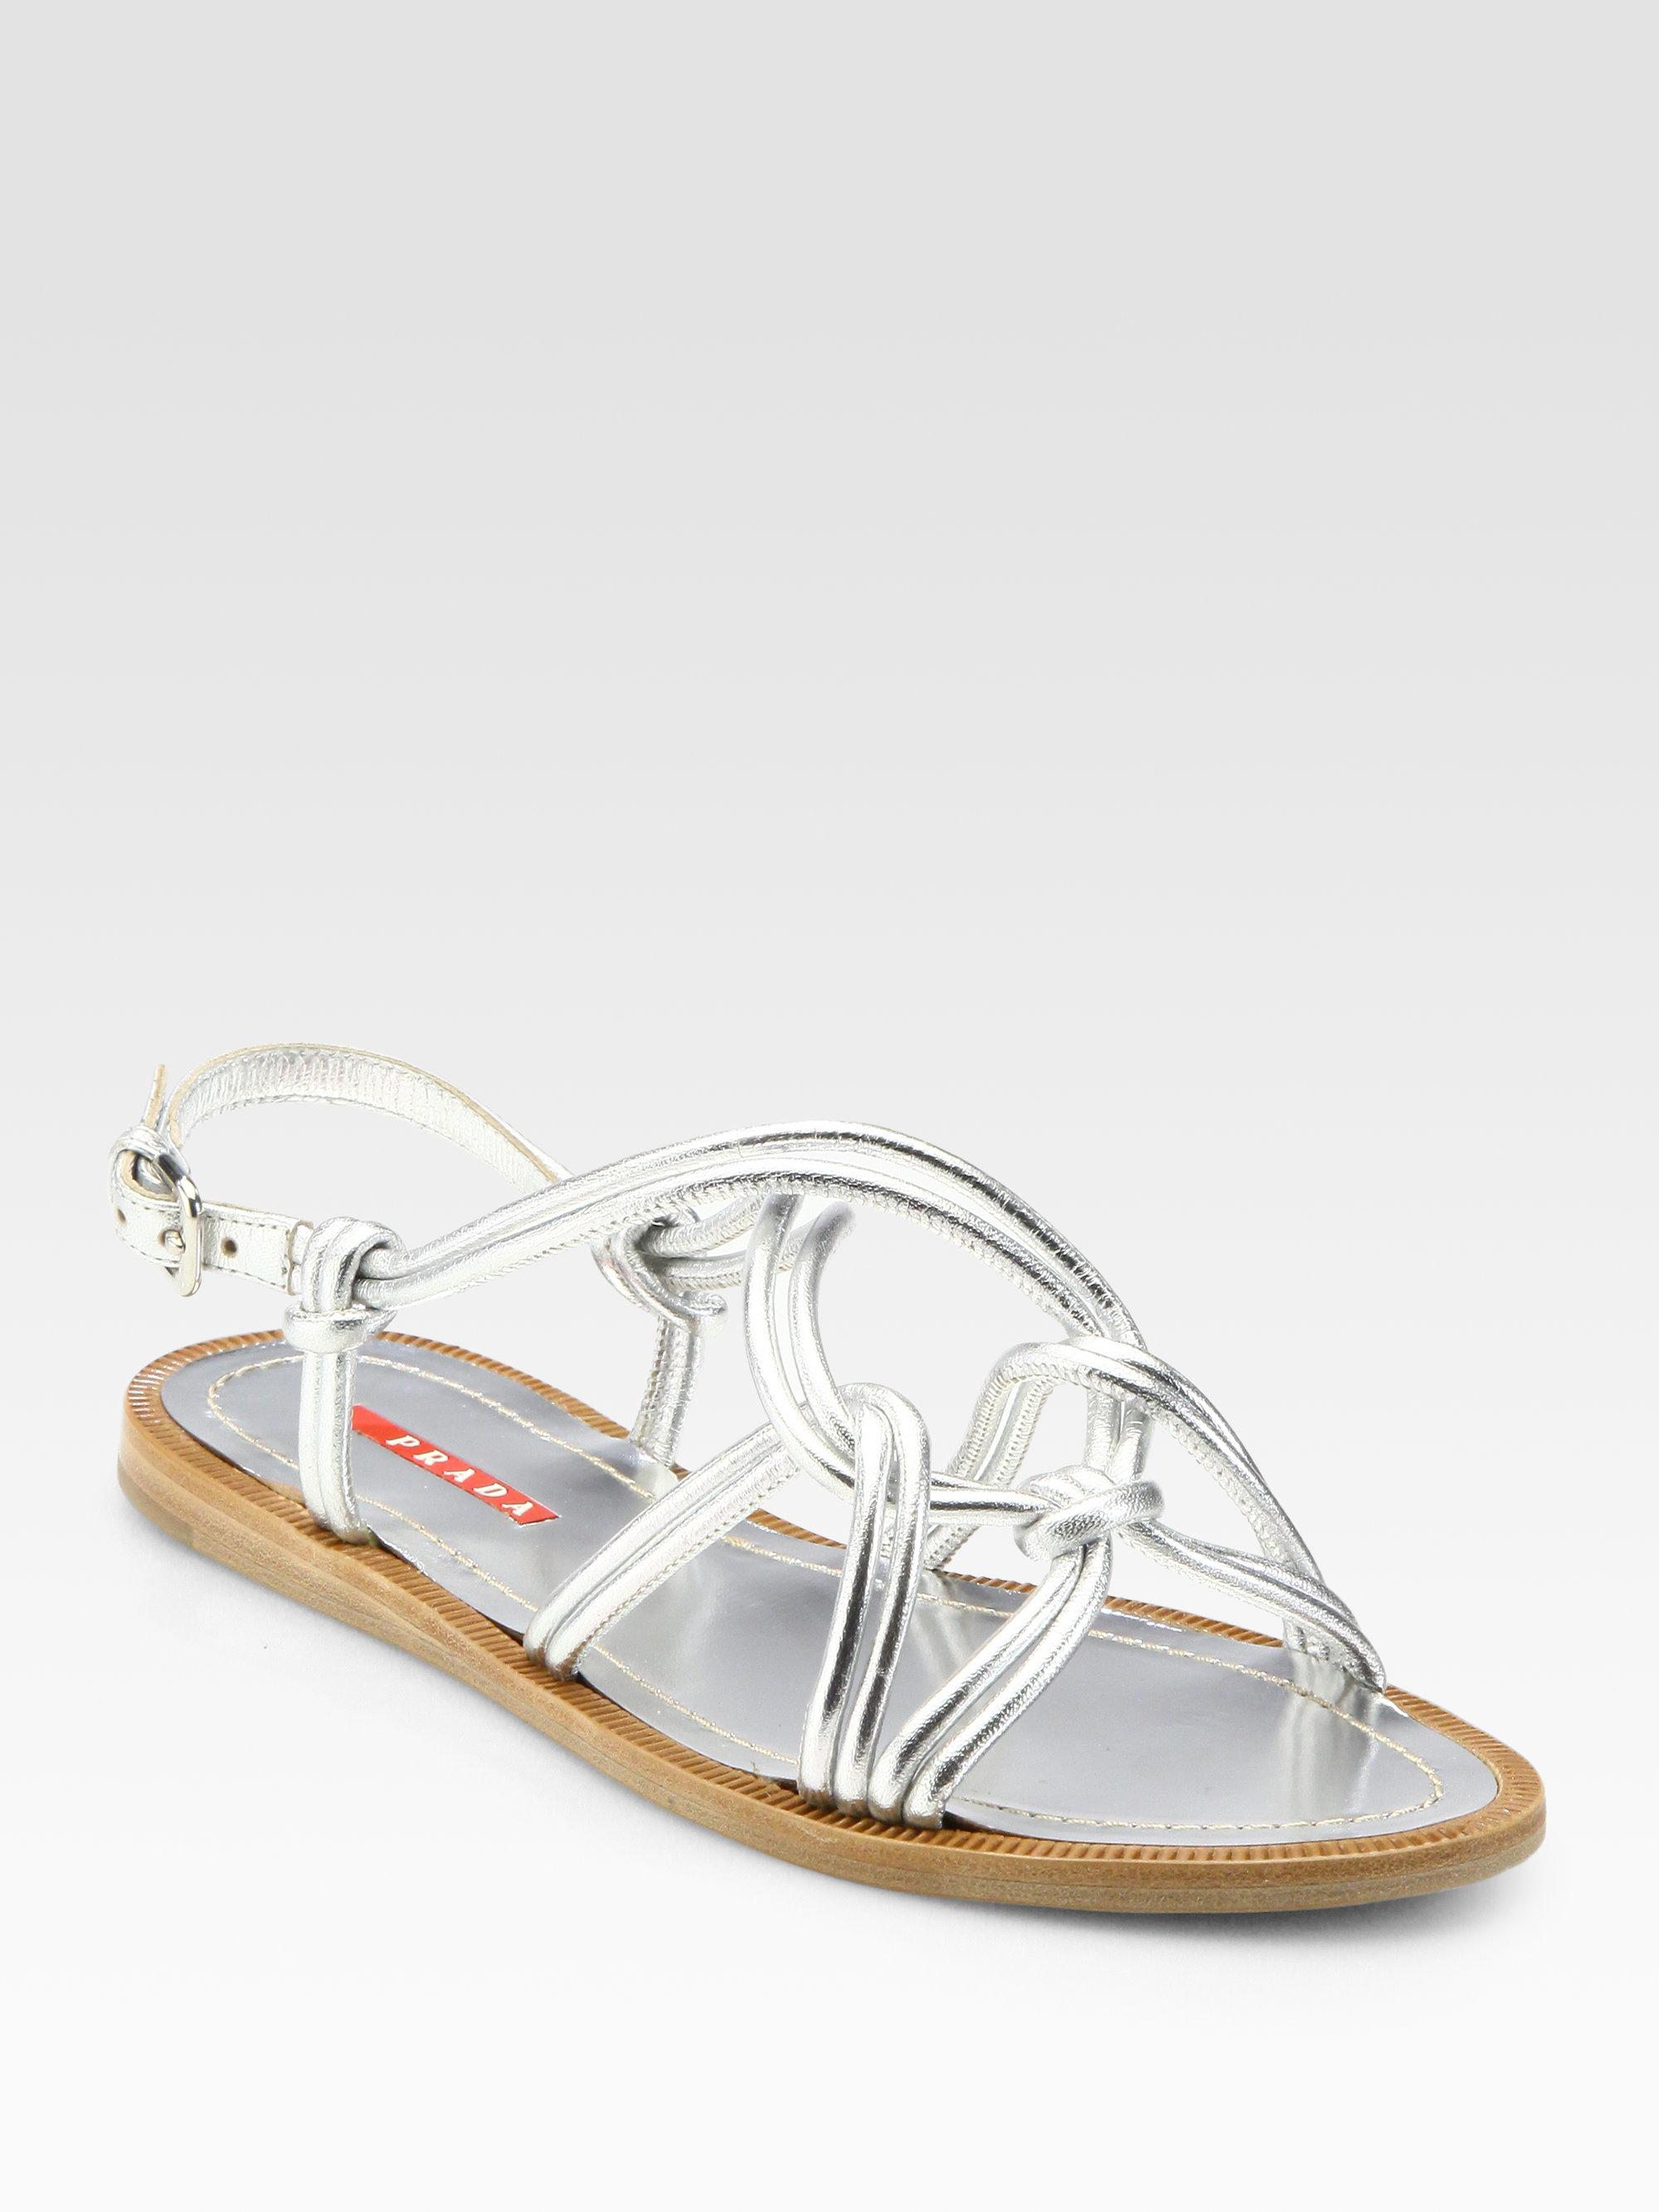 4d52b015d84 Lyst - Prada Metallic Leather Tubular Rope Sandals in Metallic